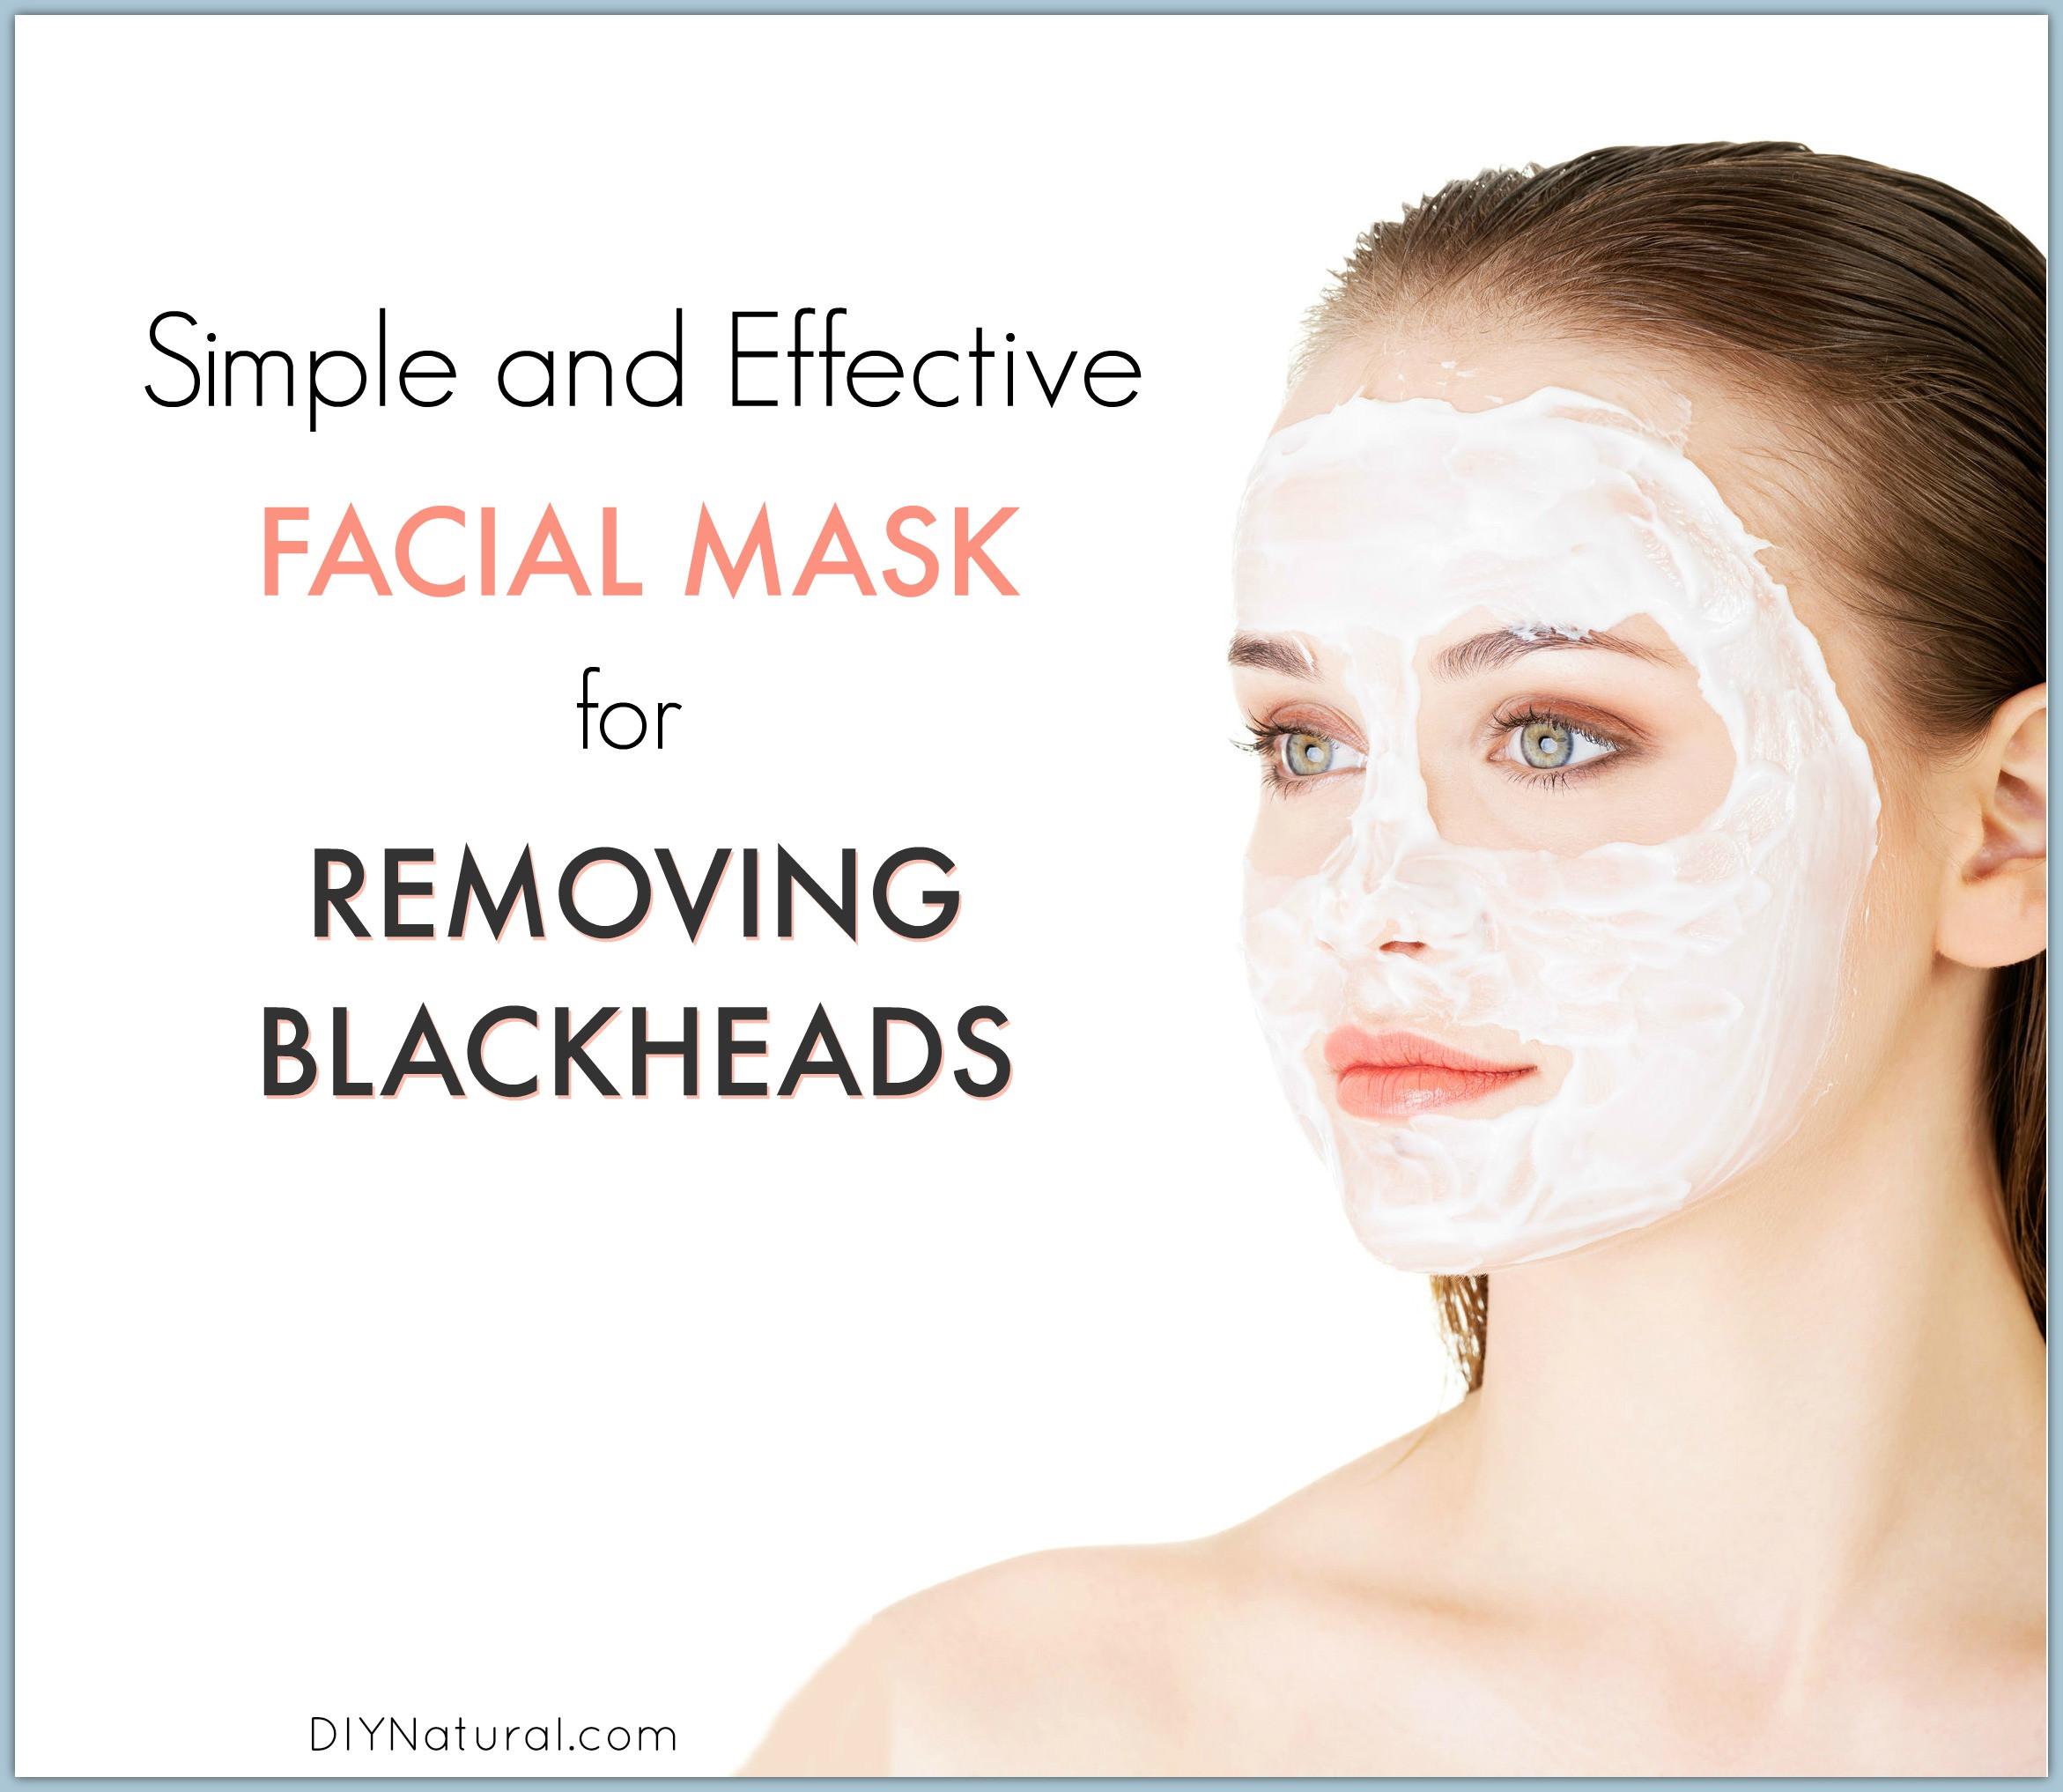 DIY Blackhead Mask  Blackheads A Quick and Easy Homemade Blackhead Mask